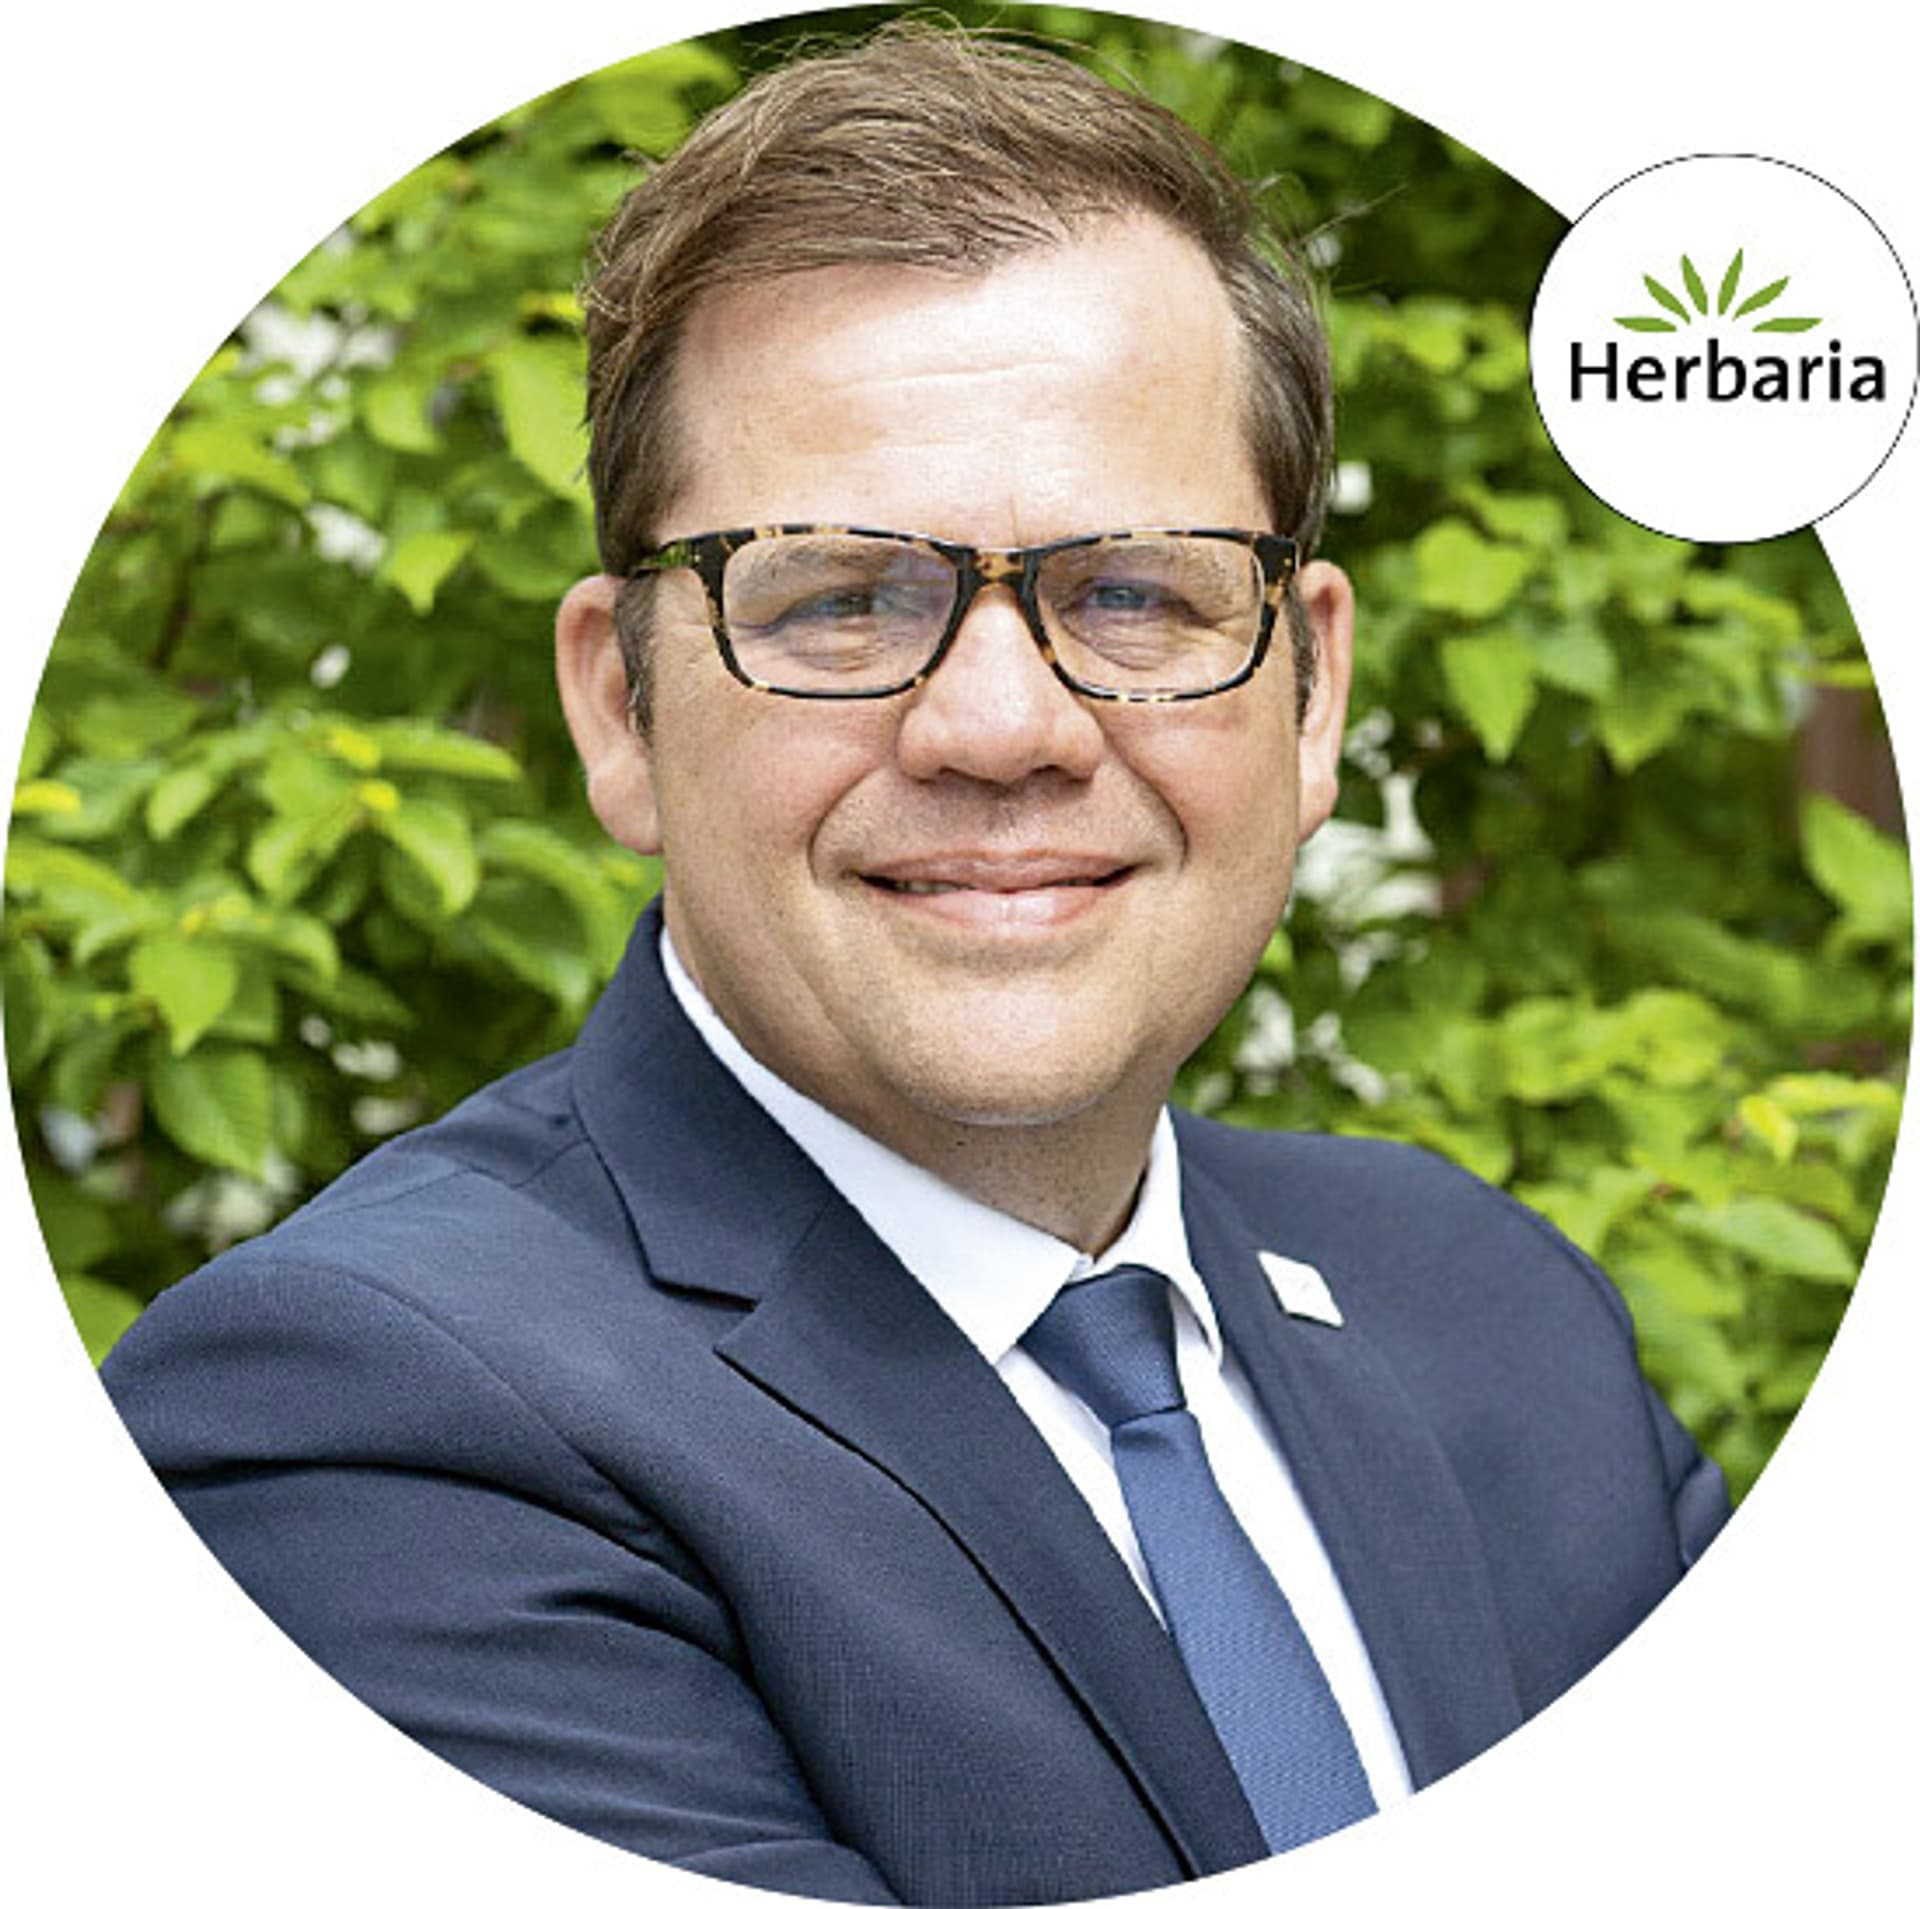 Winkler erwin 100 herbaria